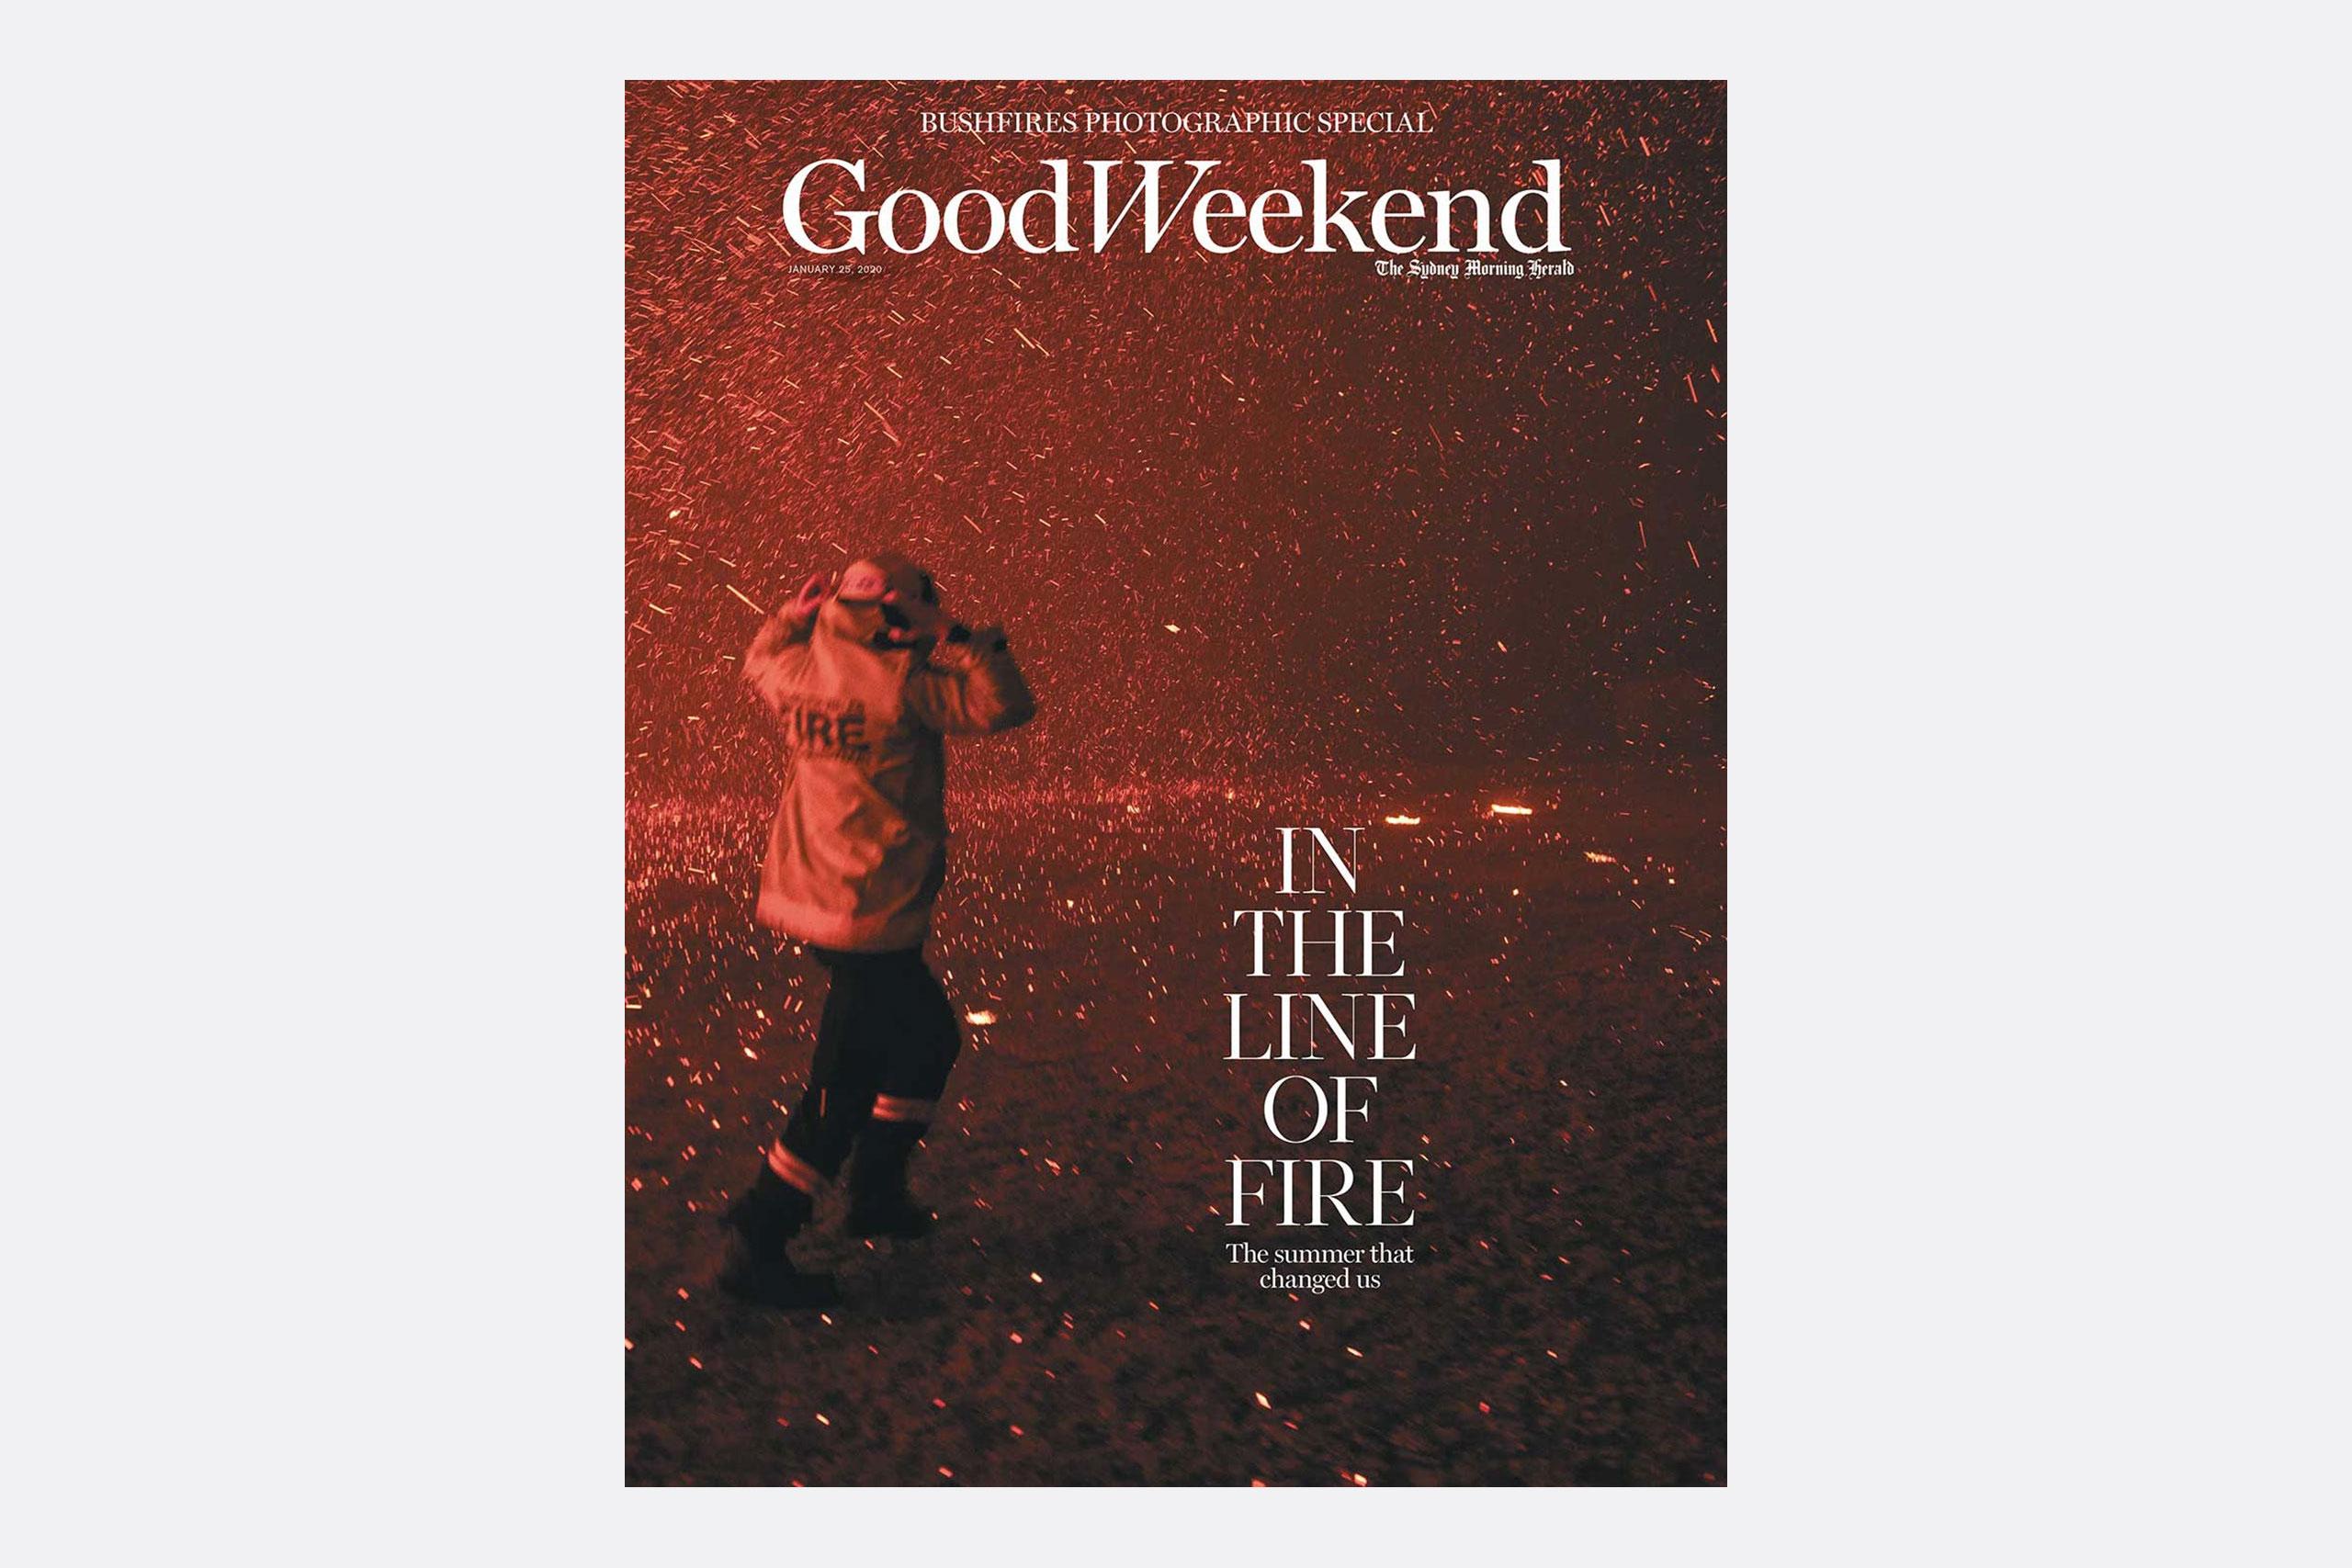 Portada de enero de Good Weekend magazine, fotografía por Nick Moir